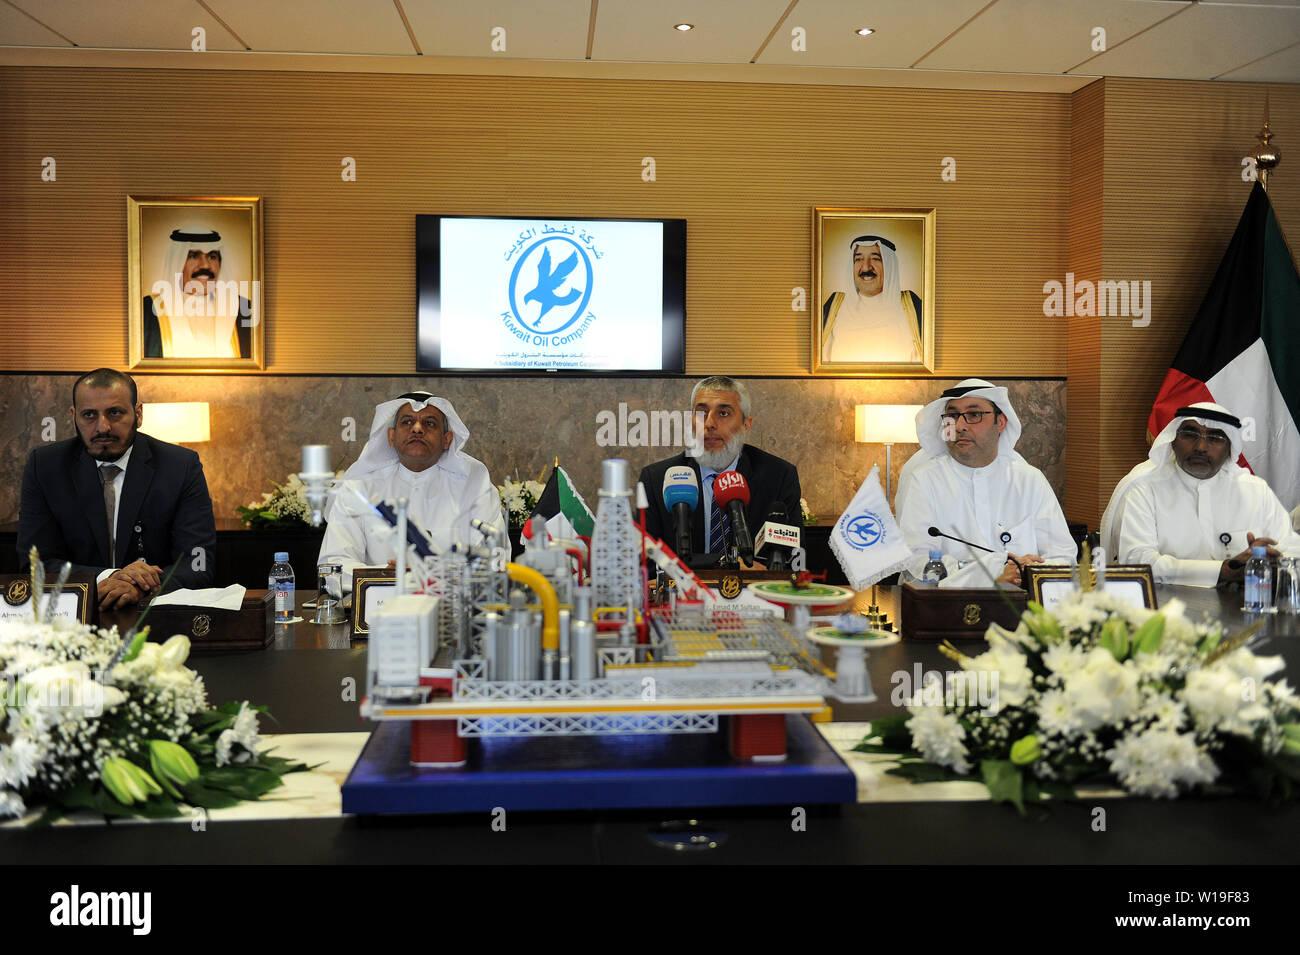 Kuwait Oil Company Stock Photos & Kuwait Oil Company Stock